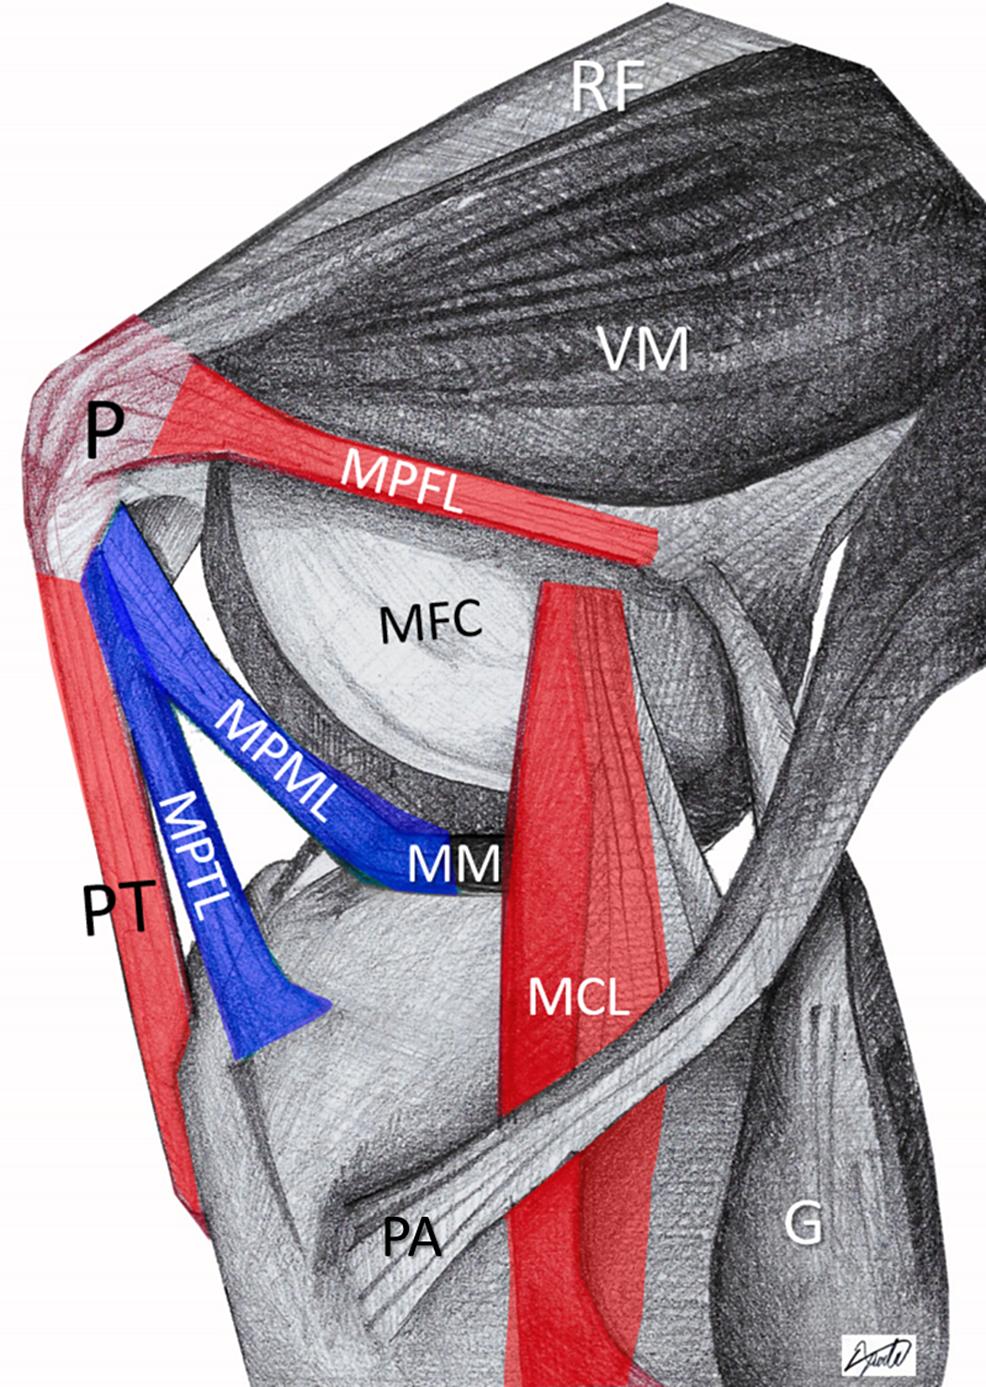 The-triangular-space-of-patellofemoral-dislocation-(red).-Patellar-dislocation-initiates-with-MPTL/MPML-rupture-(blue)